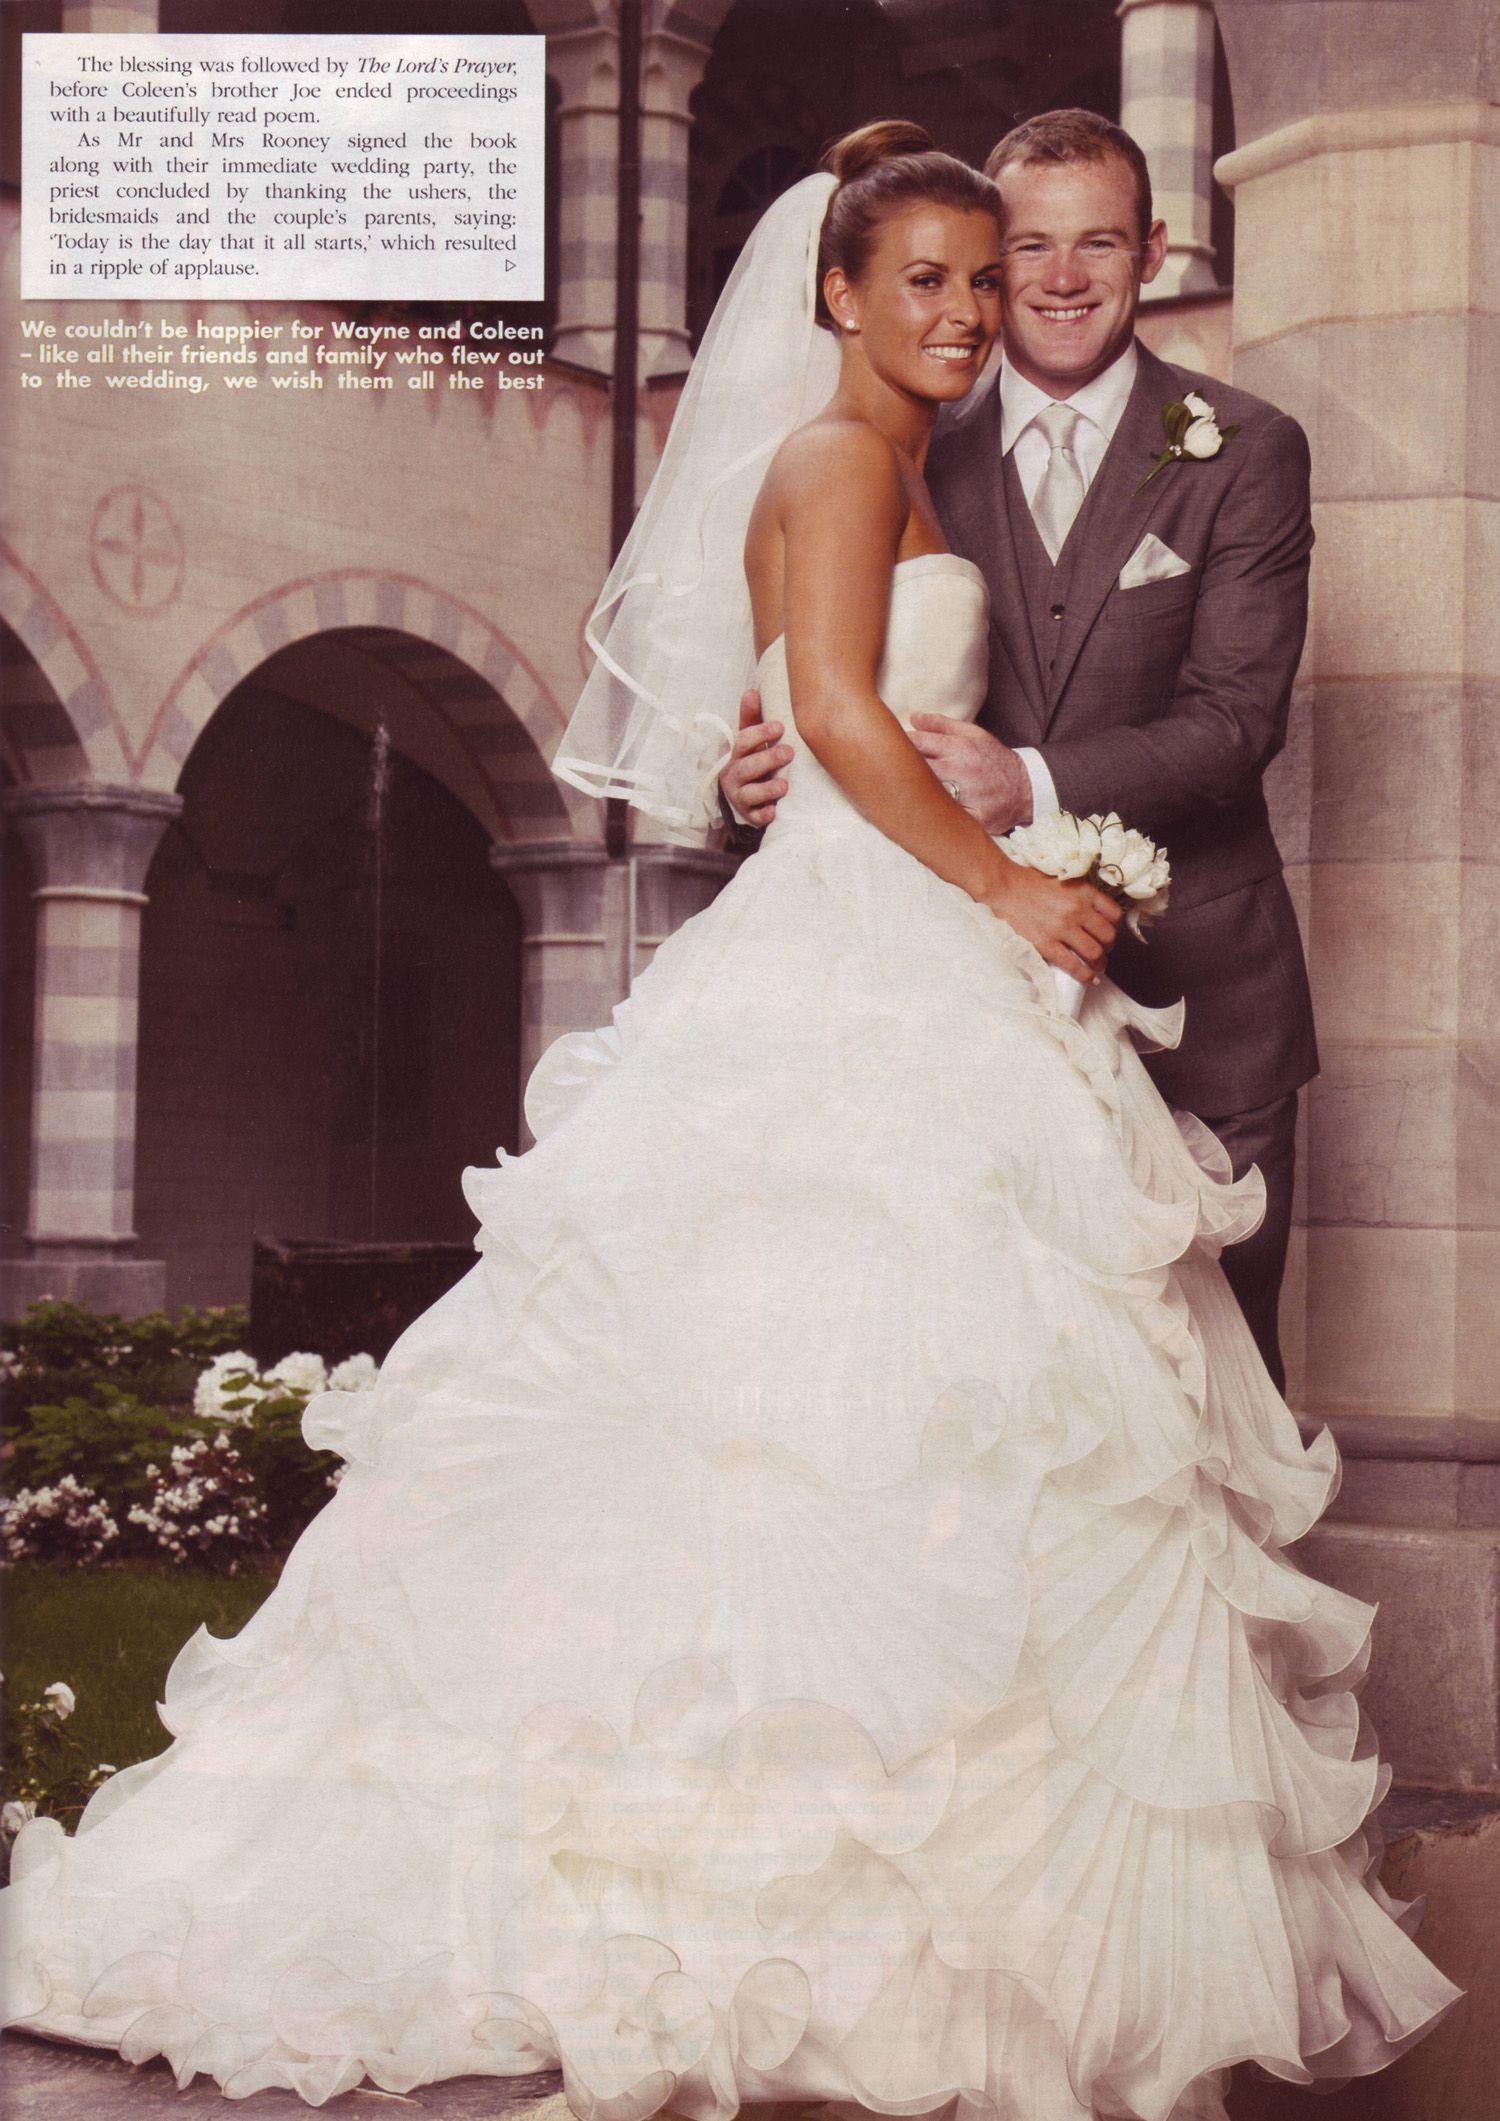 Coleen McLoughlin married to the footballer Wayne Rooney